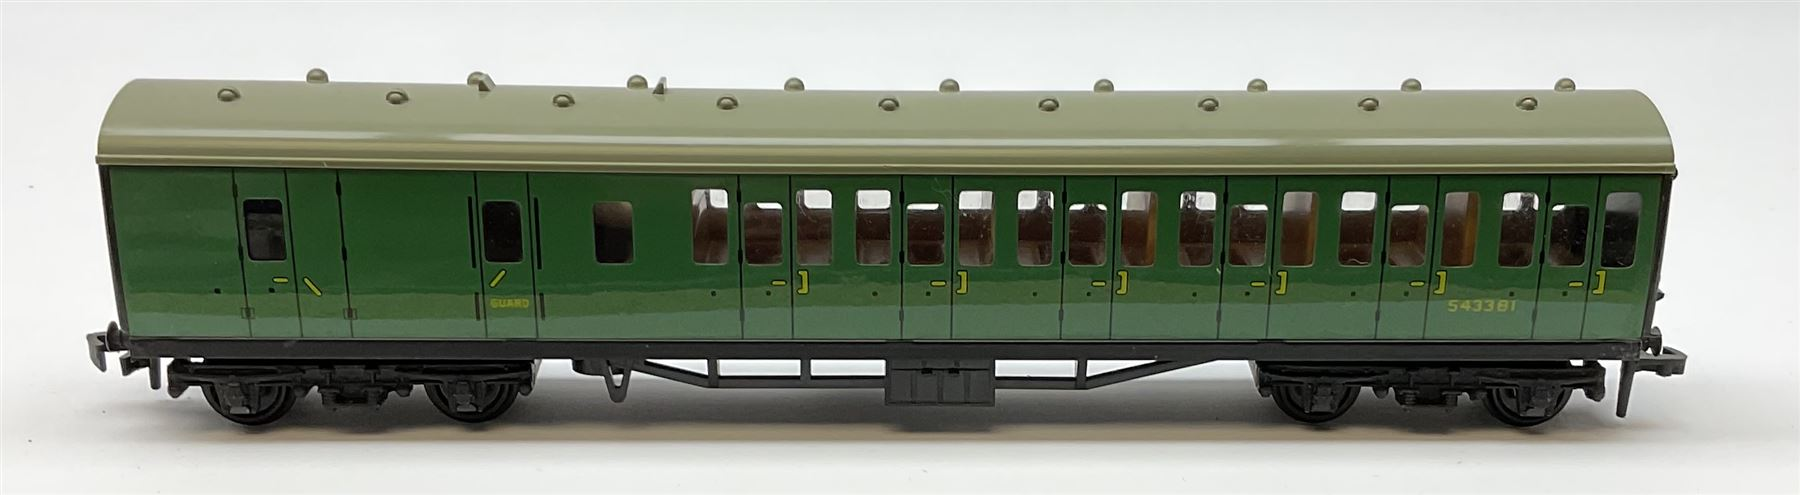 Hornby Dublo - 4075 Passenger Brake Van B.R.; 4078 Composite Sleeping Car B.R.; 4082 Suburban Coach - Image 2 of 5